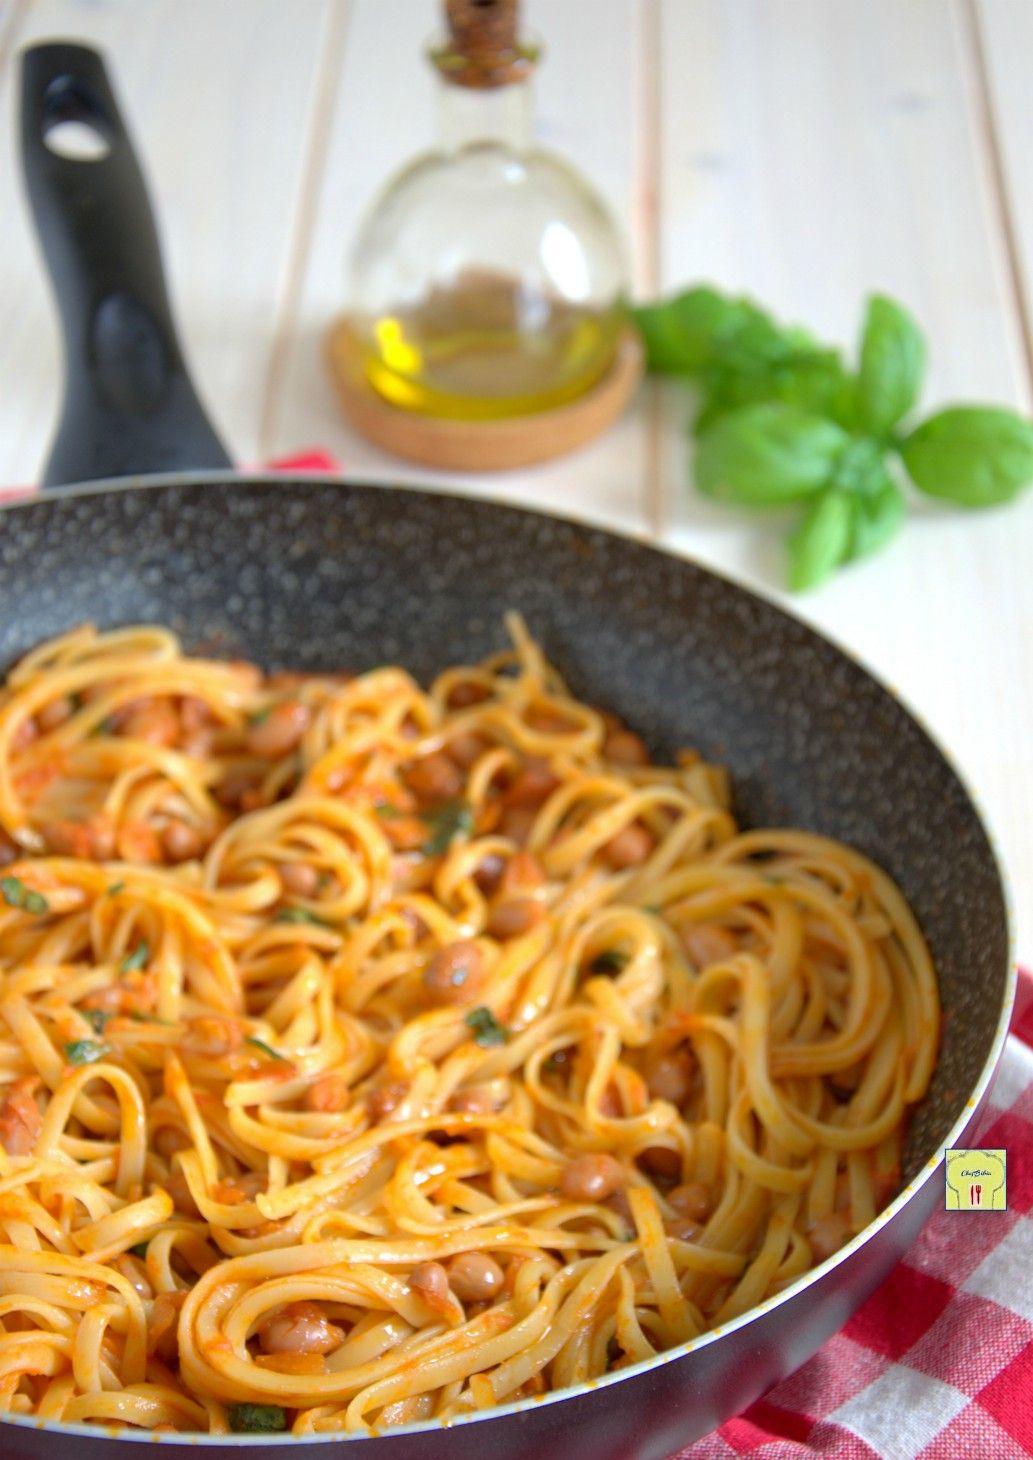 4202e45c801cc1f61363c03753facbf7 - Ricette Pastasciutta